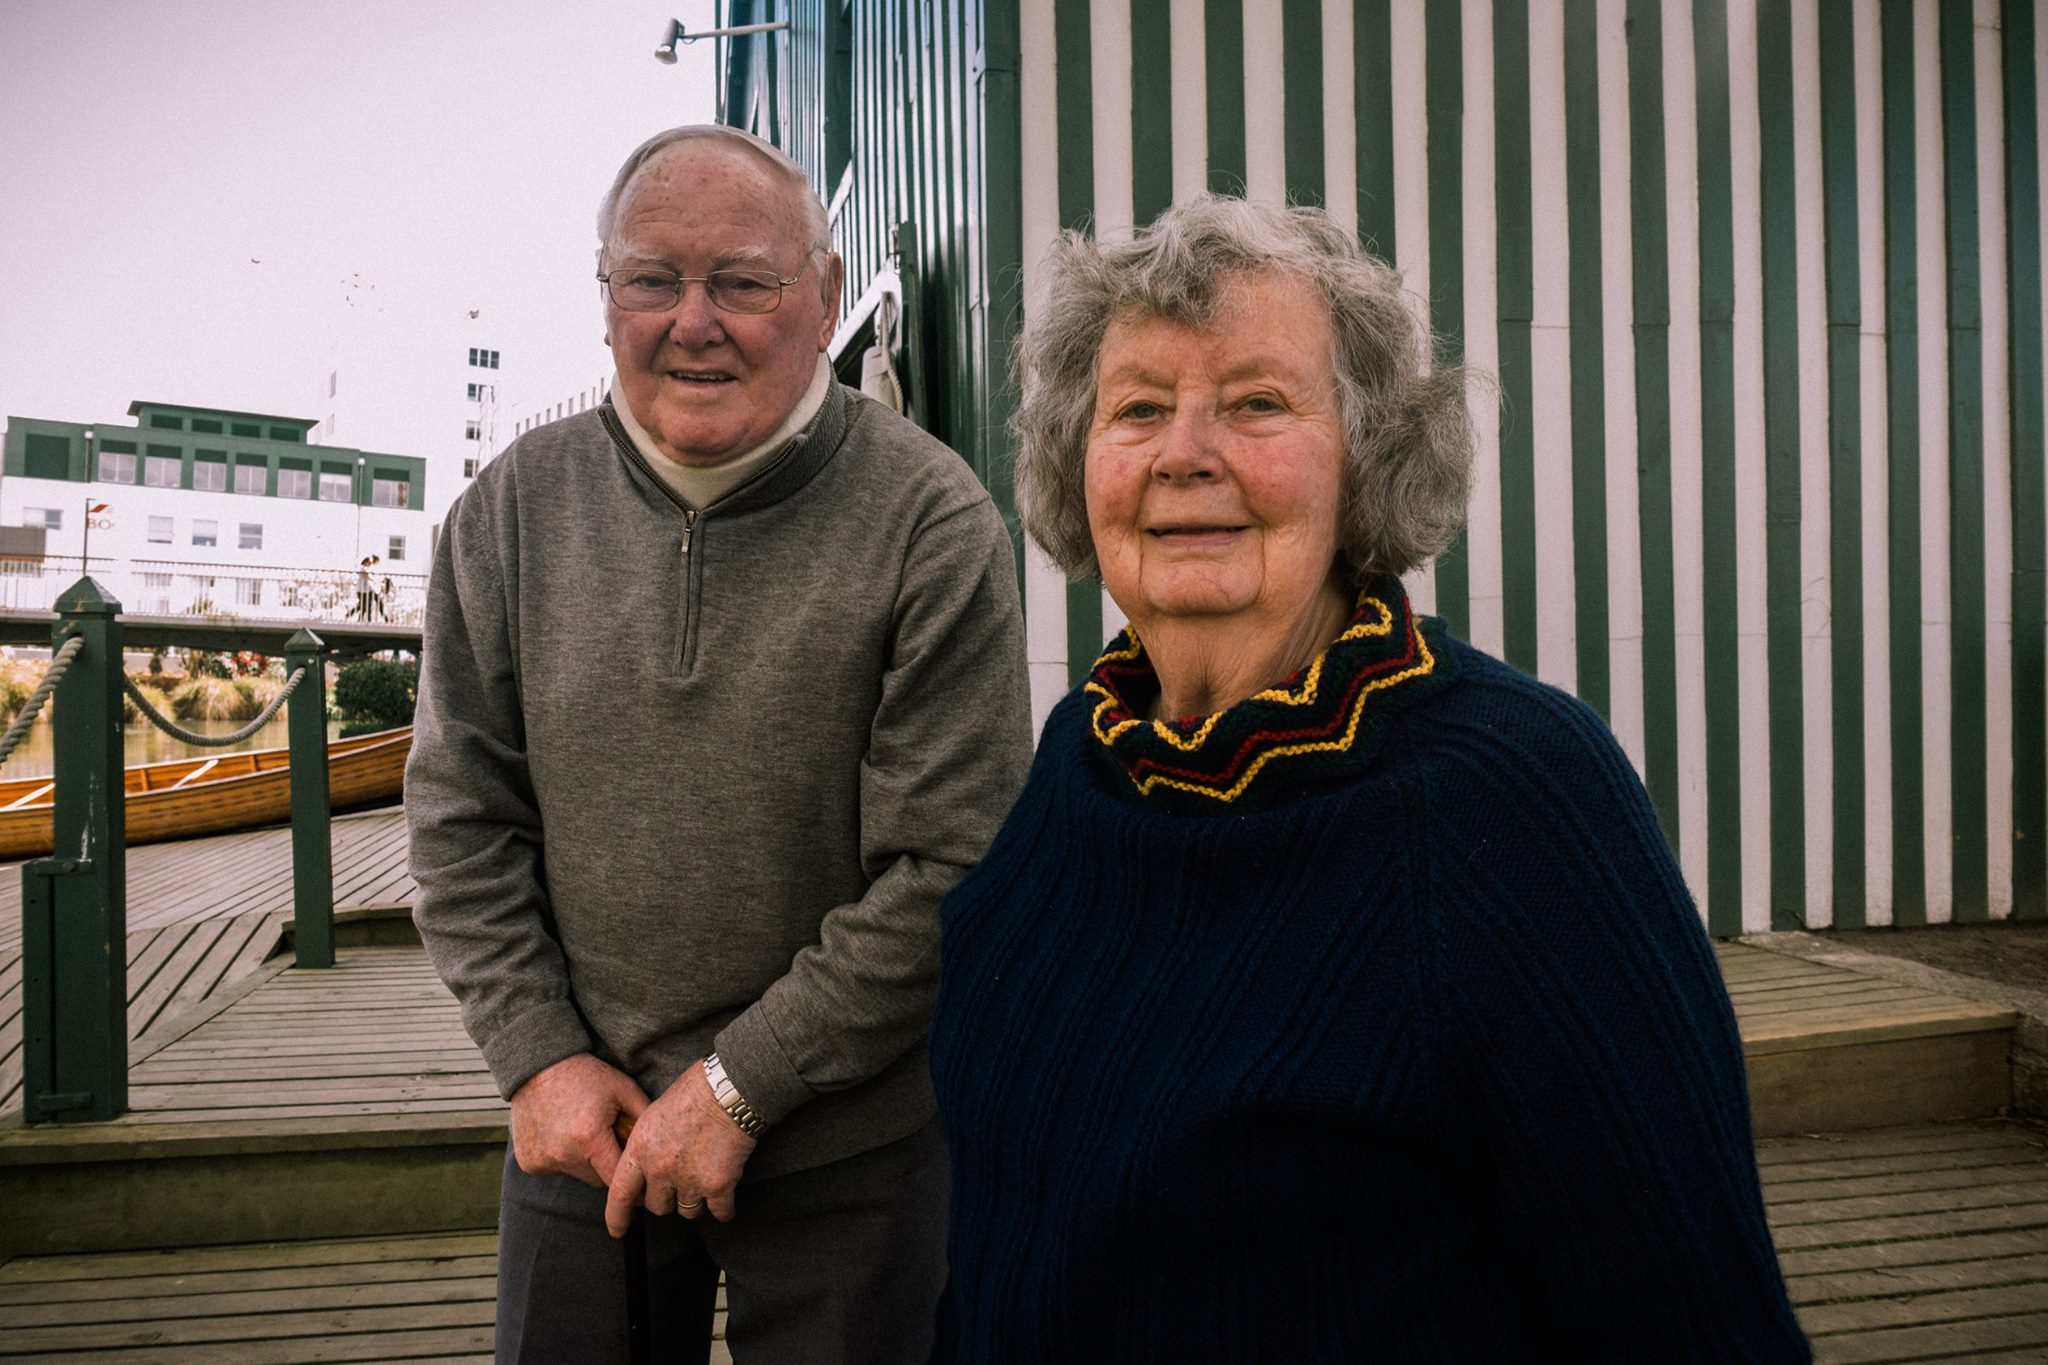 Stranger(s) 15 - Don and Lorraine